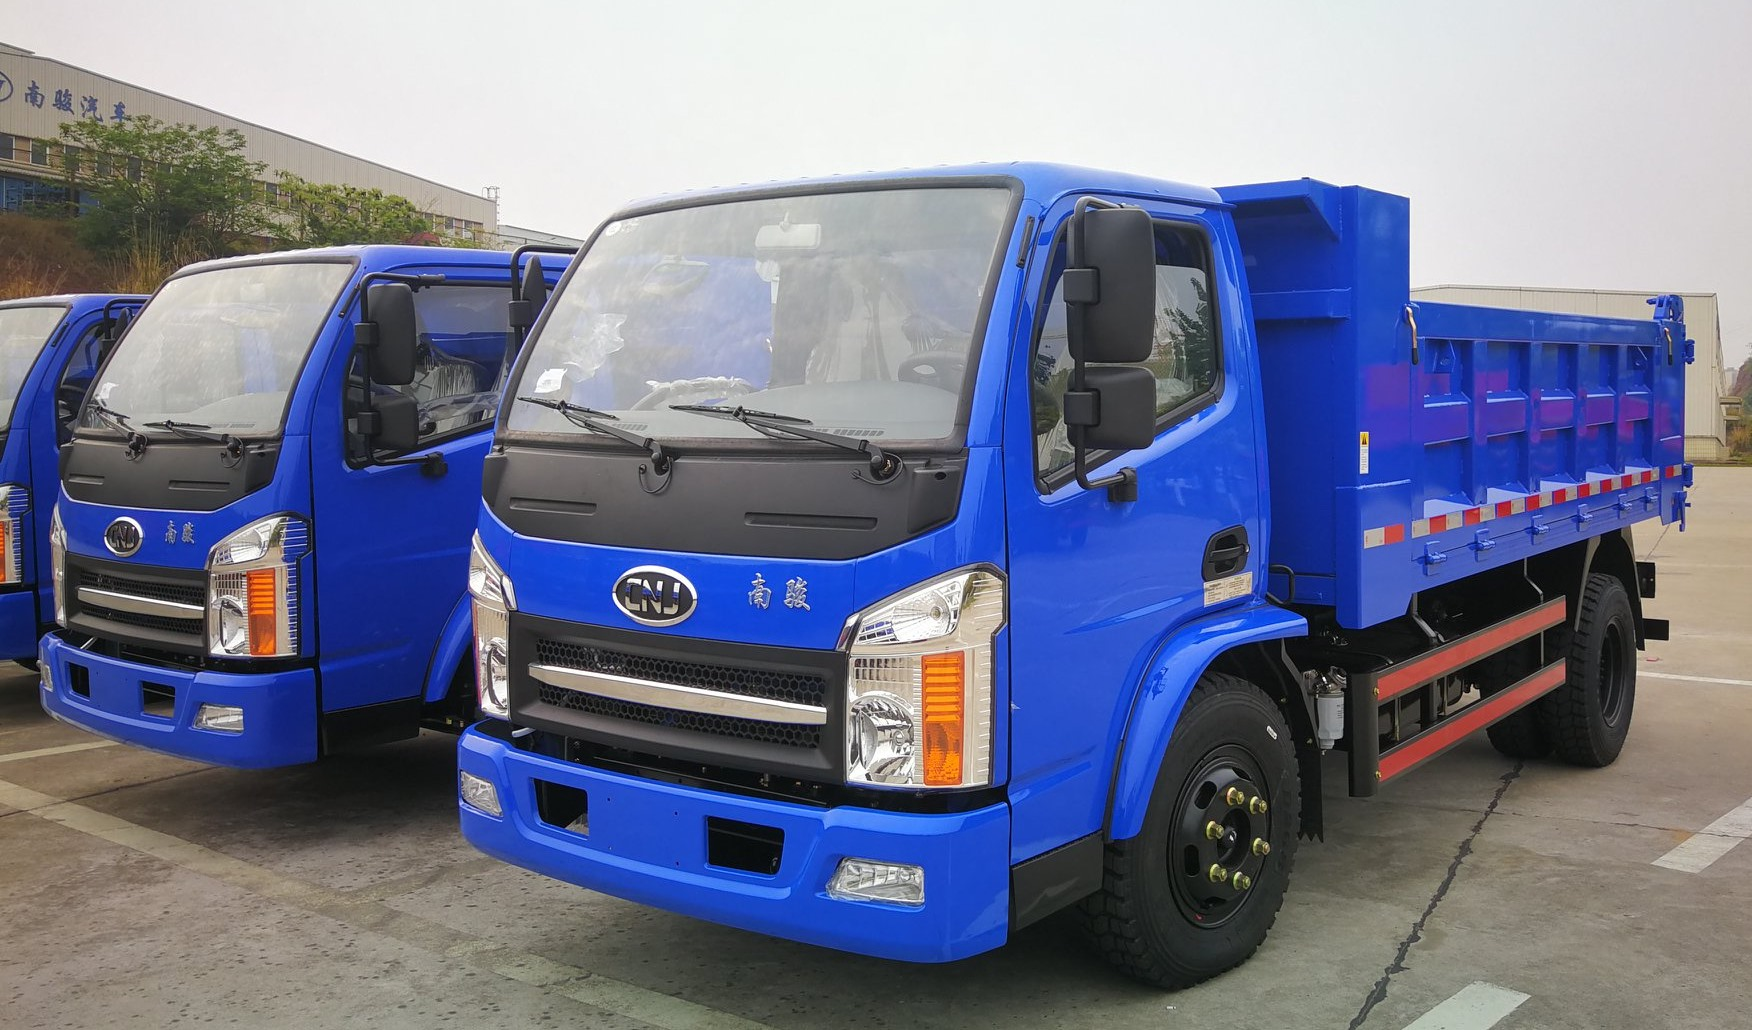 Dumper---diesel-motor-van-80-pk-tot-180-pk---lading-van-4-ton-tot-20-ton21